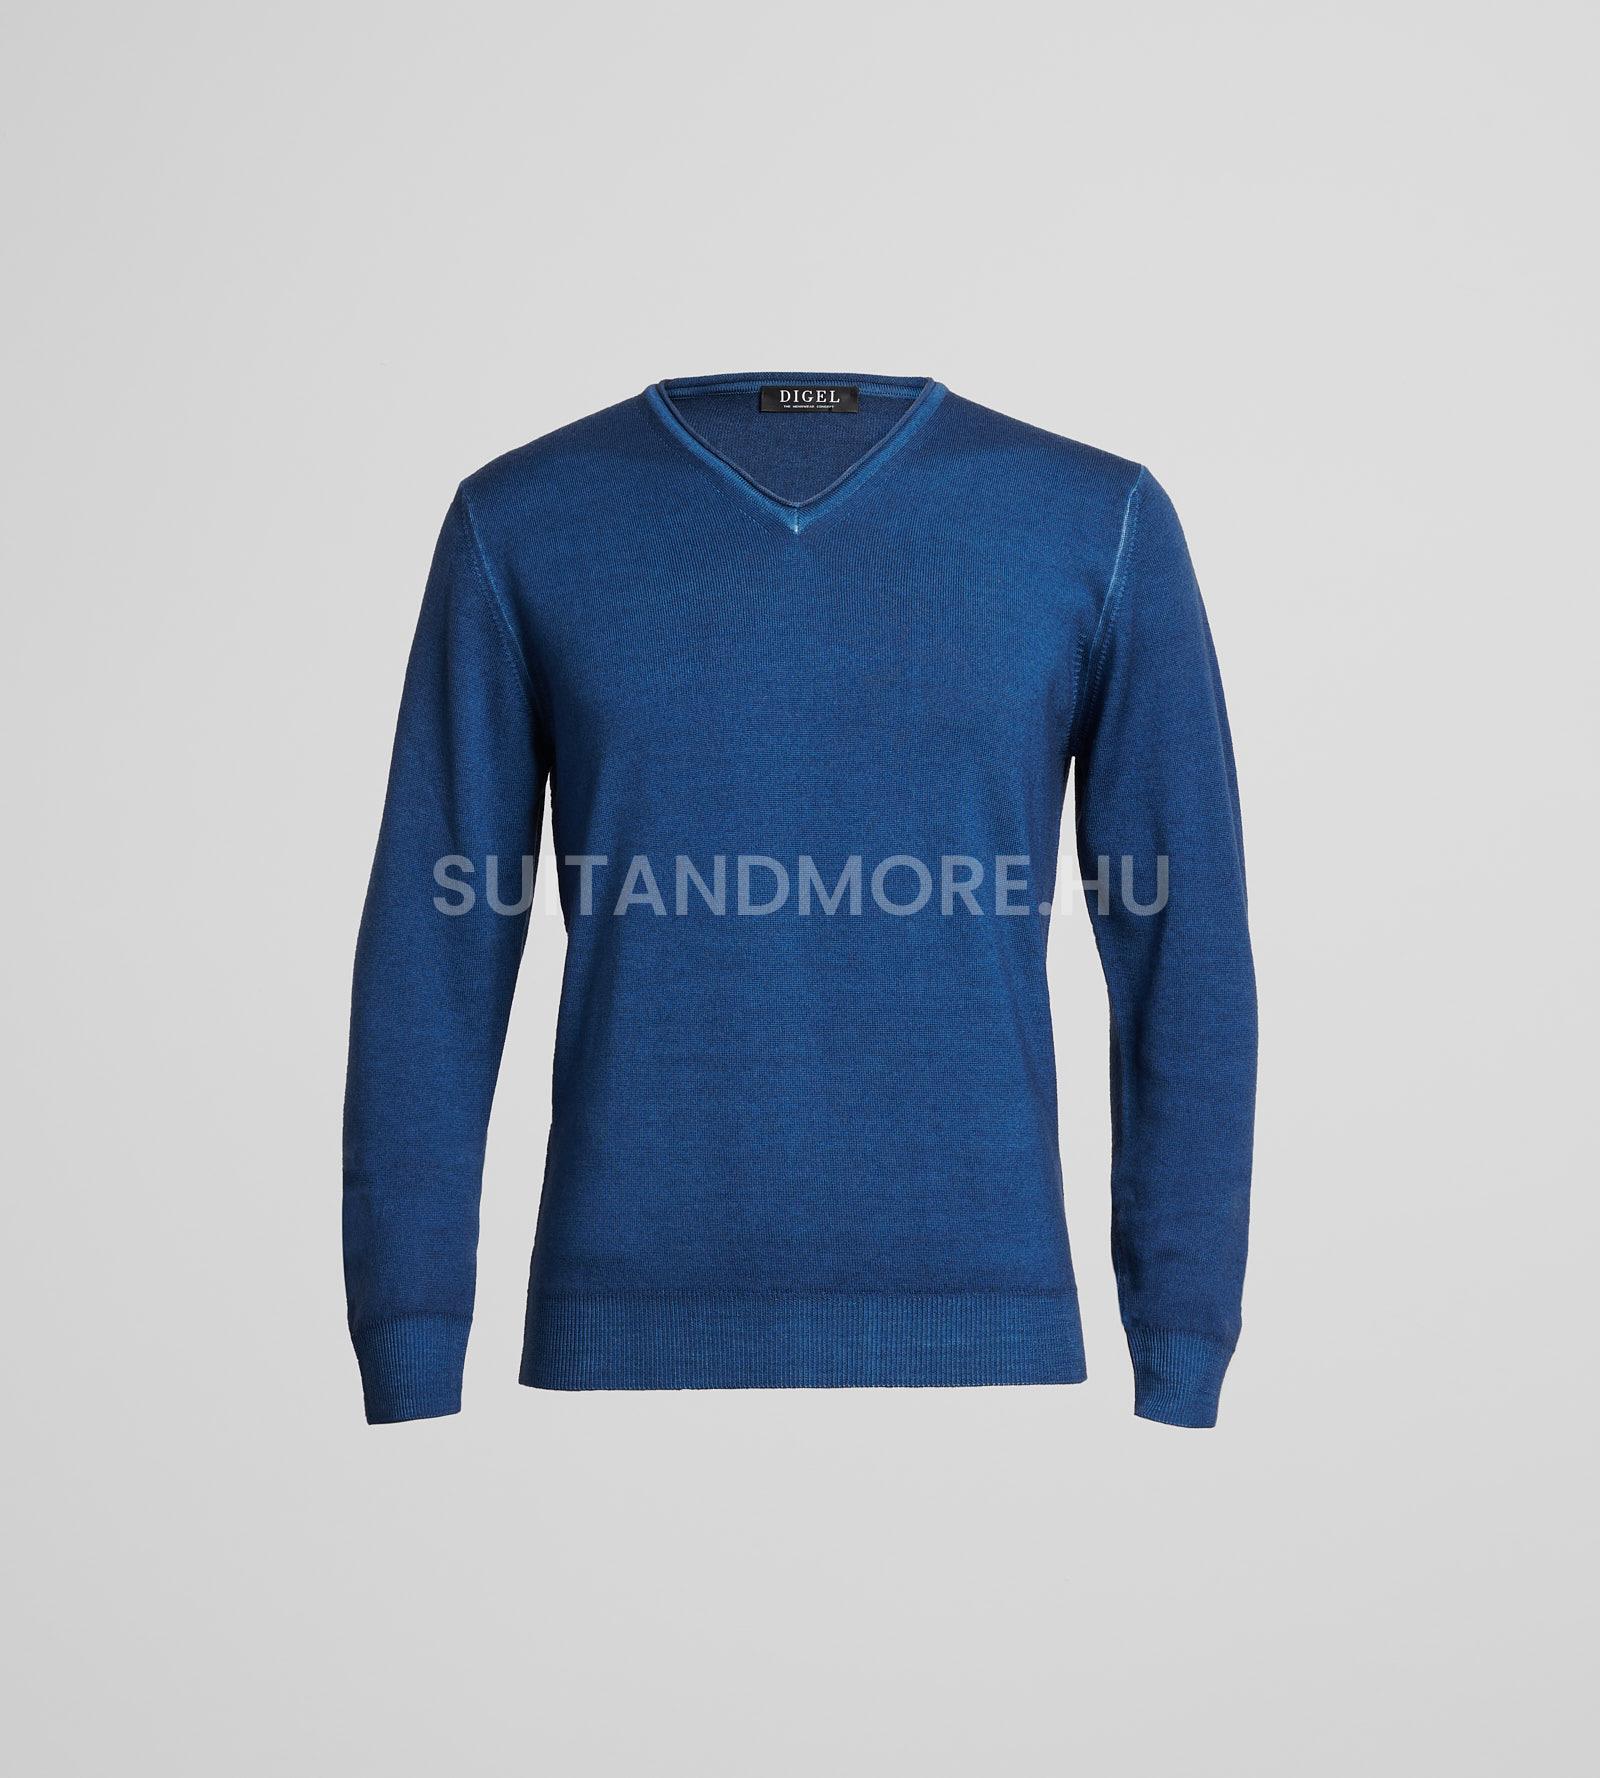 digel-kozepkek-modern-fit-v-nyaku-gyapju-pulover-fabrizio1-1-1288001-22-01